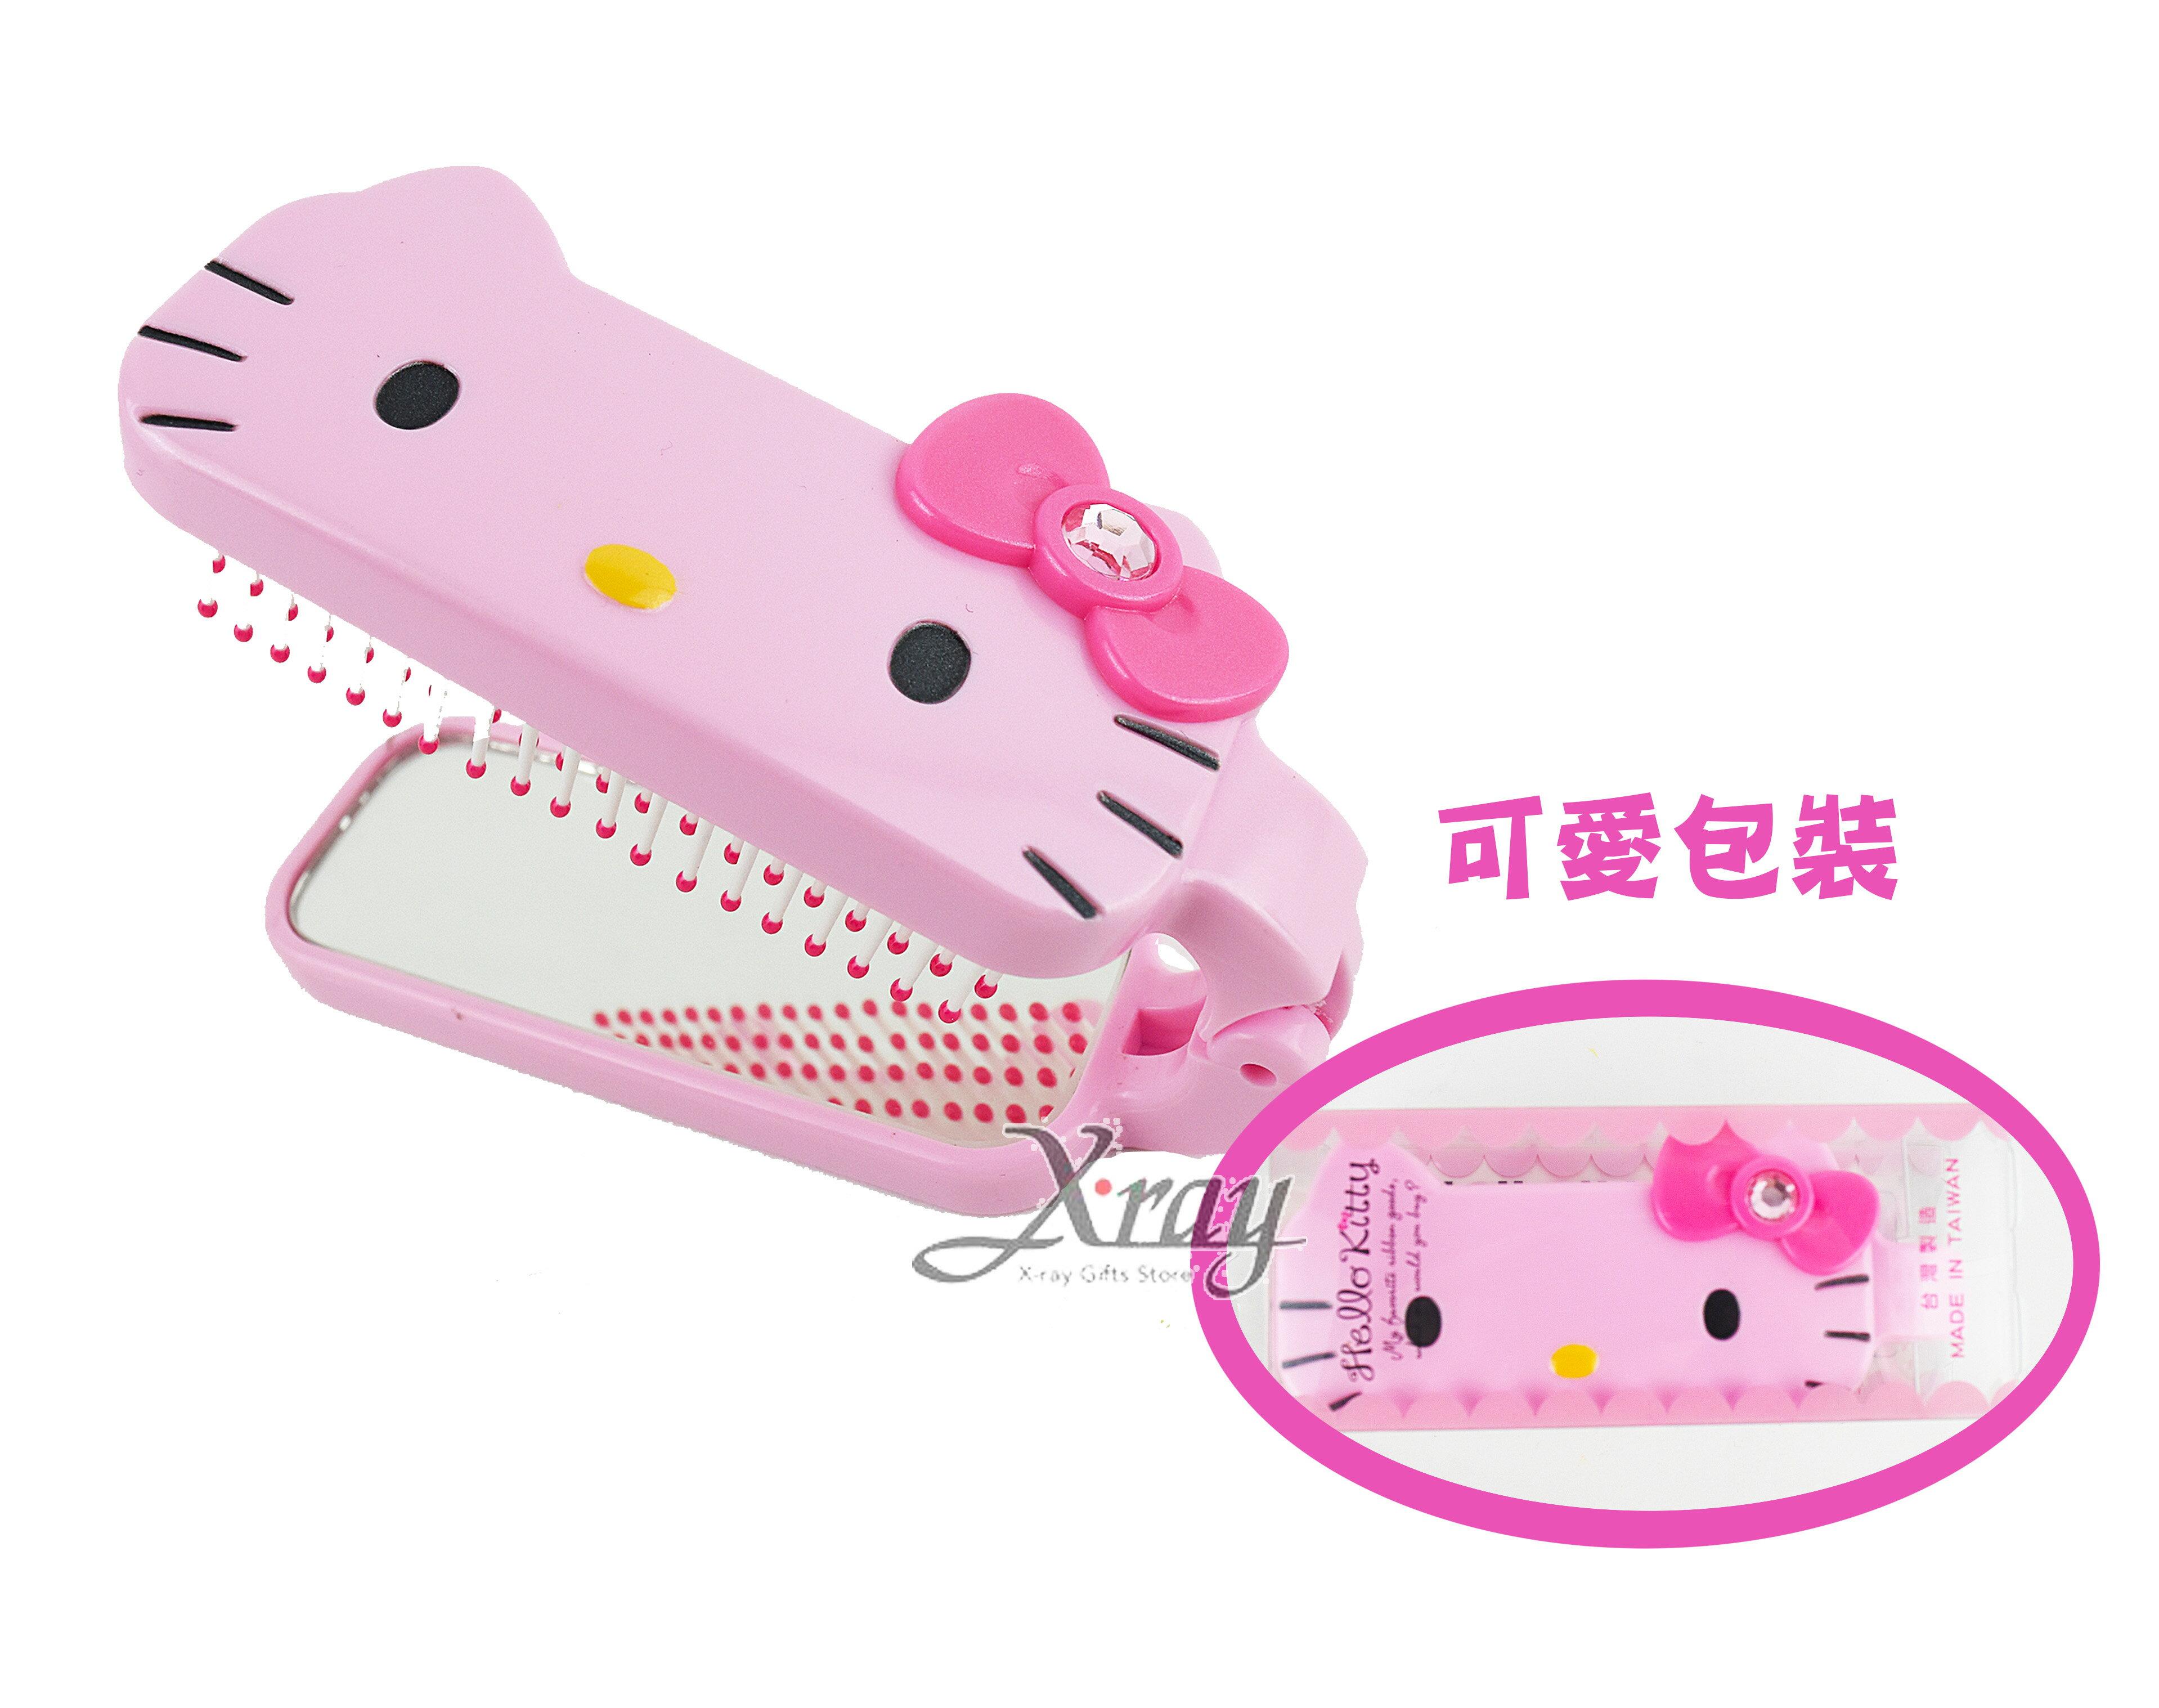 X射線【C273100】Hello Kitty 鏡梳組-方臉,鏡子/健康按摩梳/氣囊梳子/氣墊梳子/隨身鏡/方鏡/立鏡/化妝鏡/摺疊鏡/摺疊梳